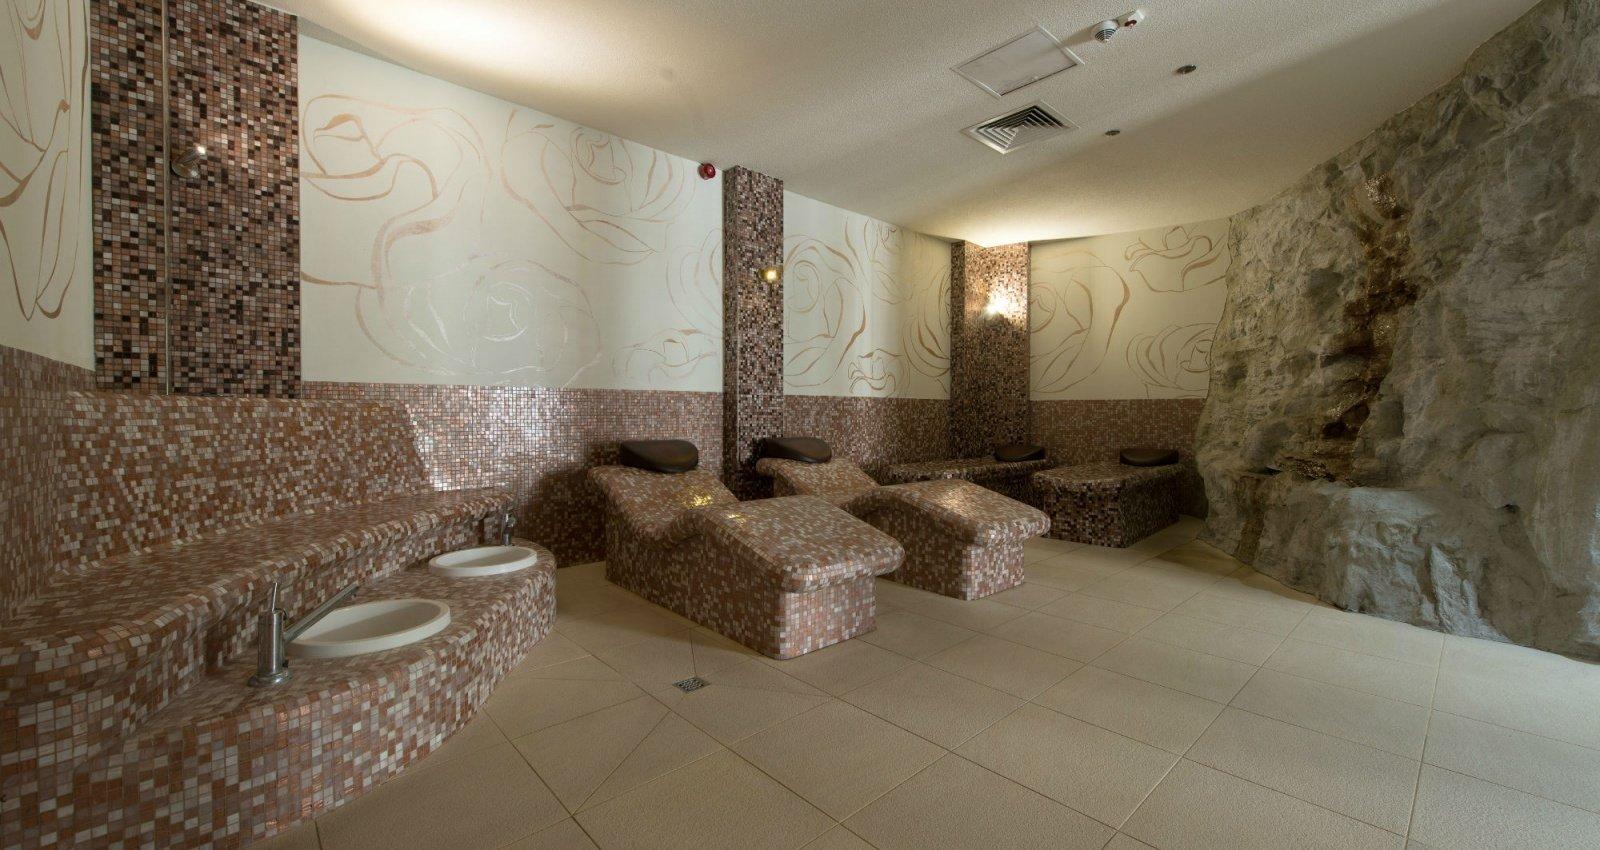 http://u.profitroom.pl/hotelleda.pl/thumb/1600x850/uploads/Basen_i_sauny/13.jpg?size=stretch&mode=crop